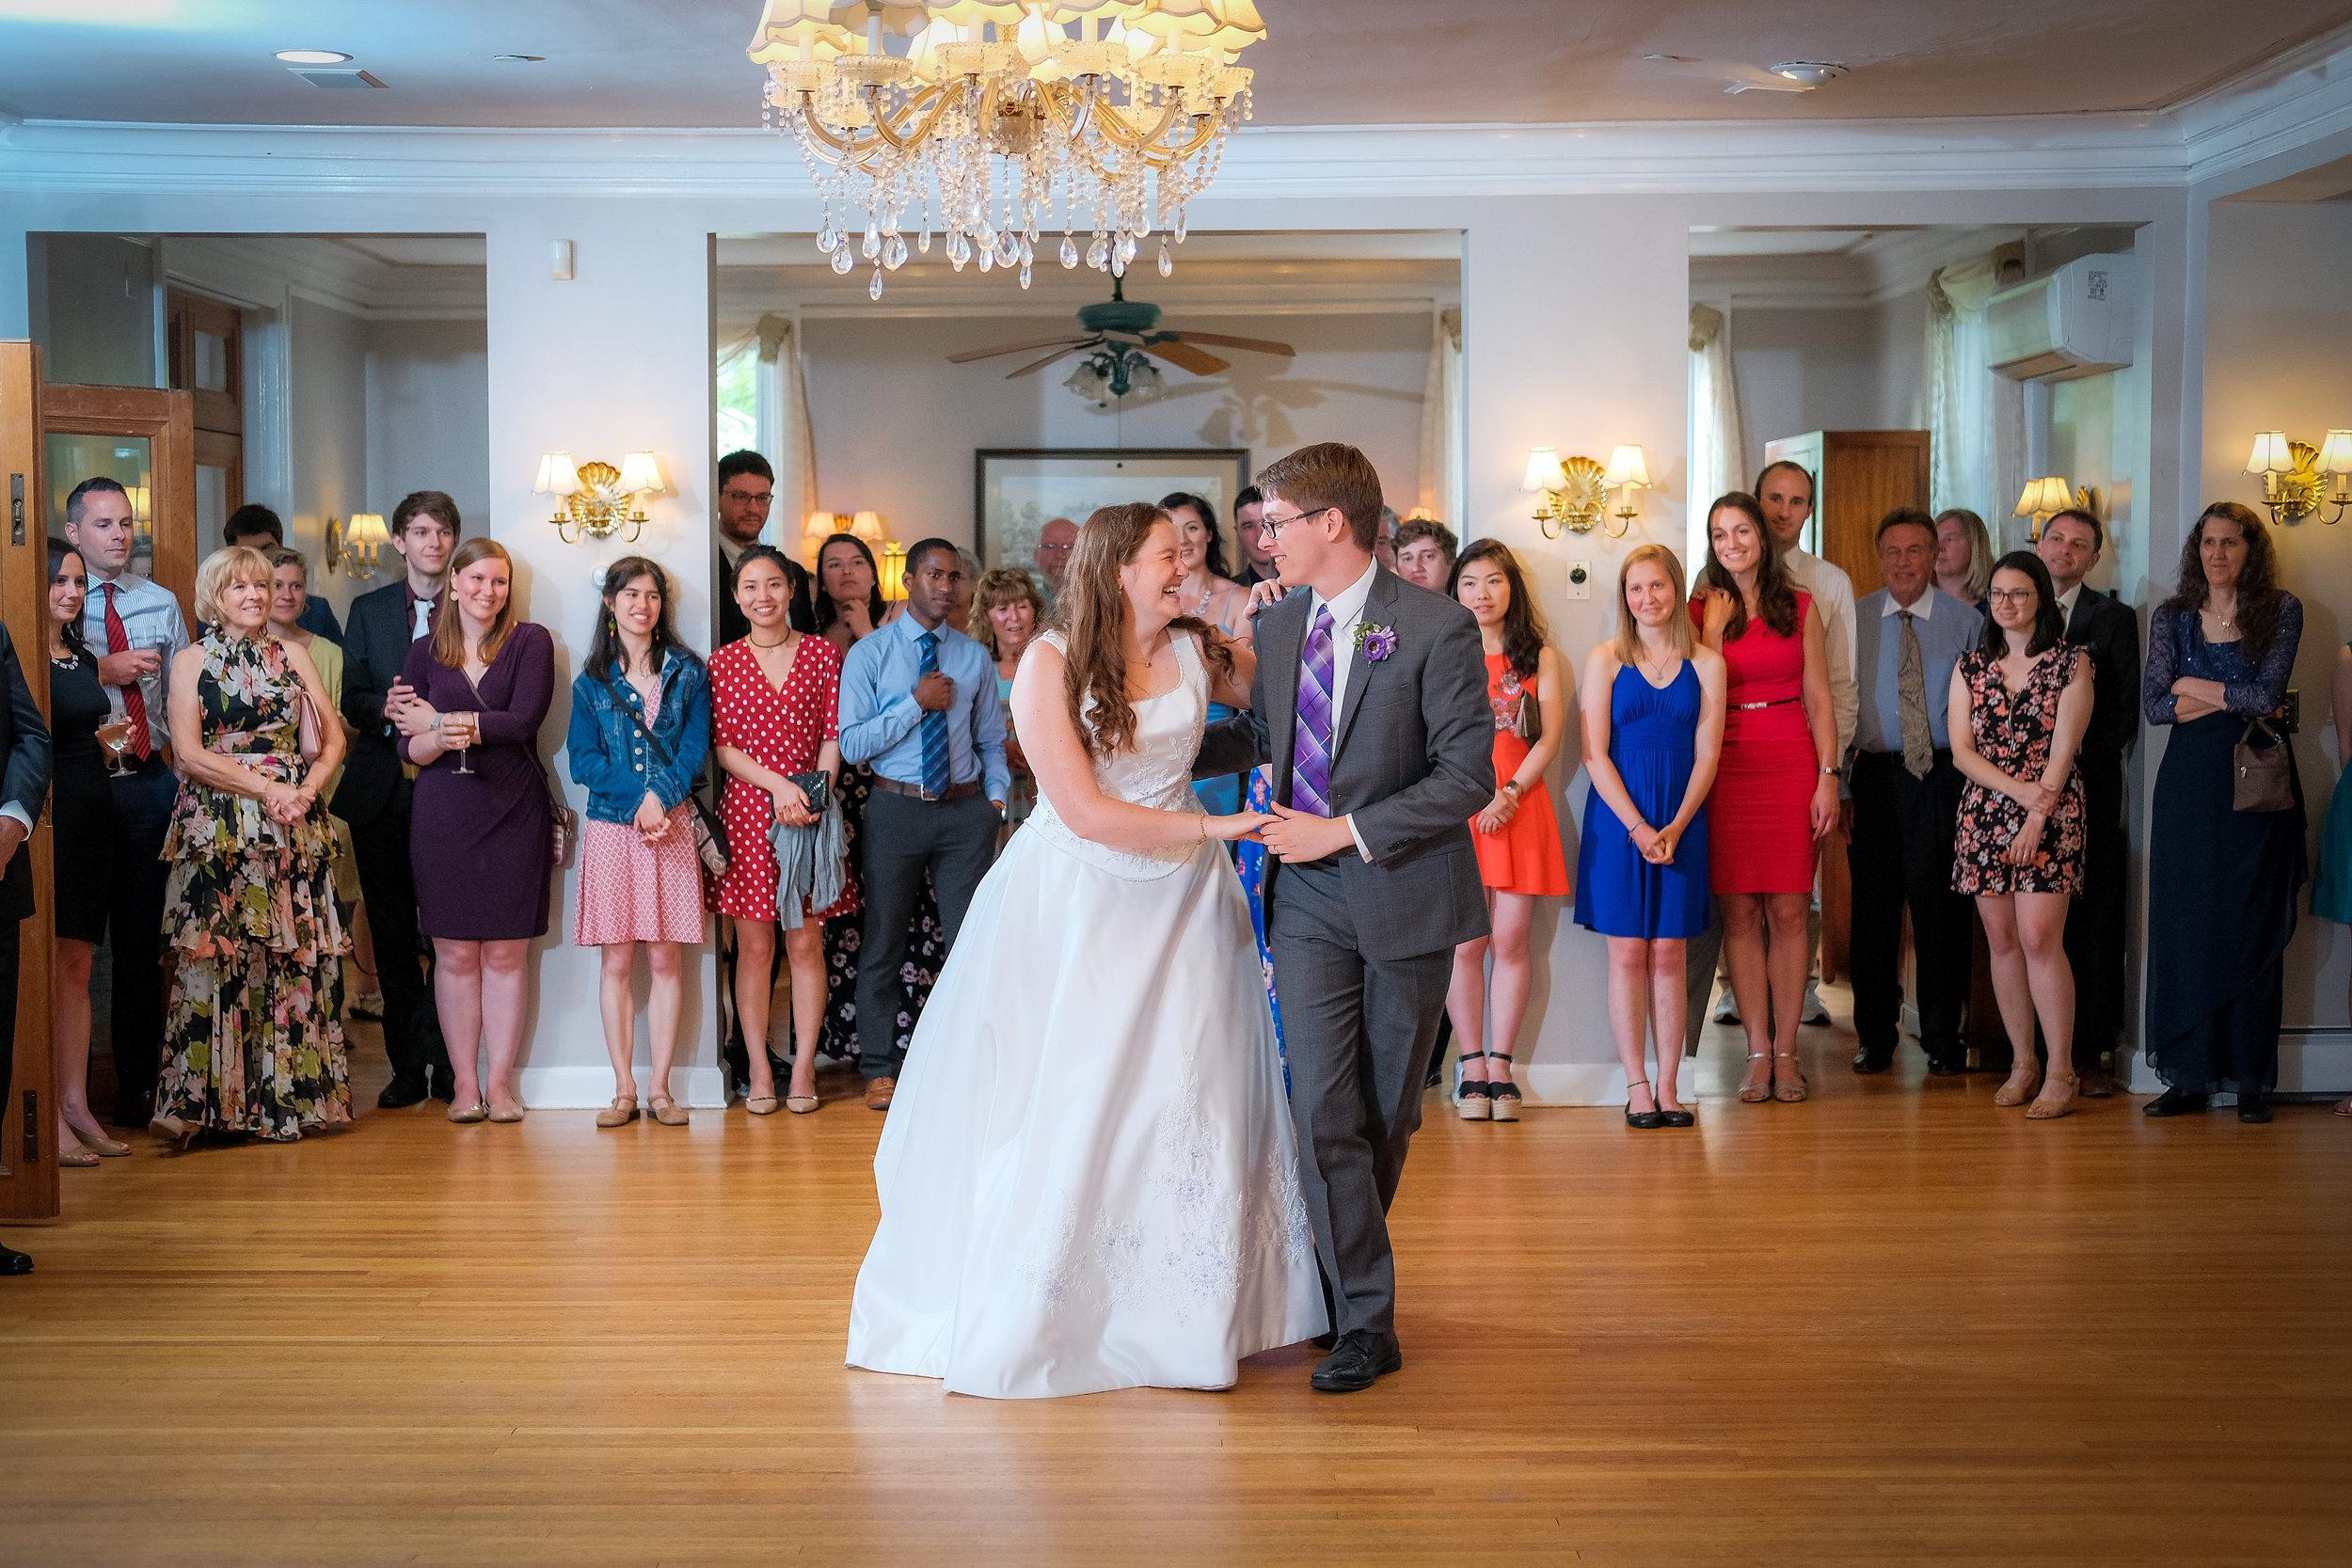 Vermont-Lilac-Inn-Wedding-Photography-1029.jpg